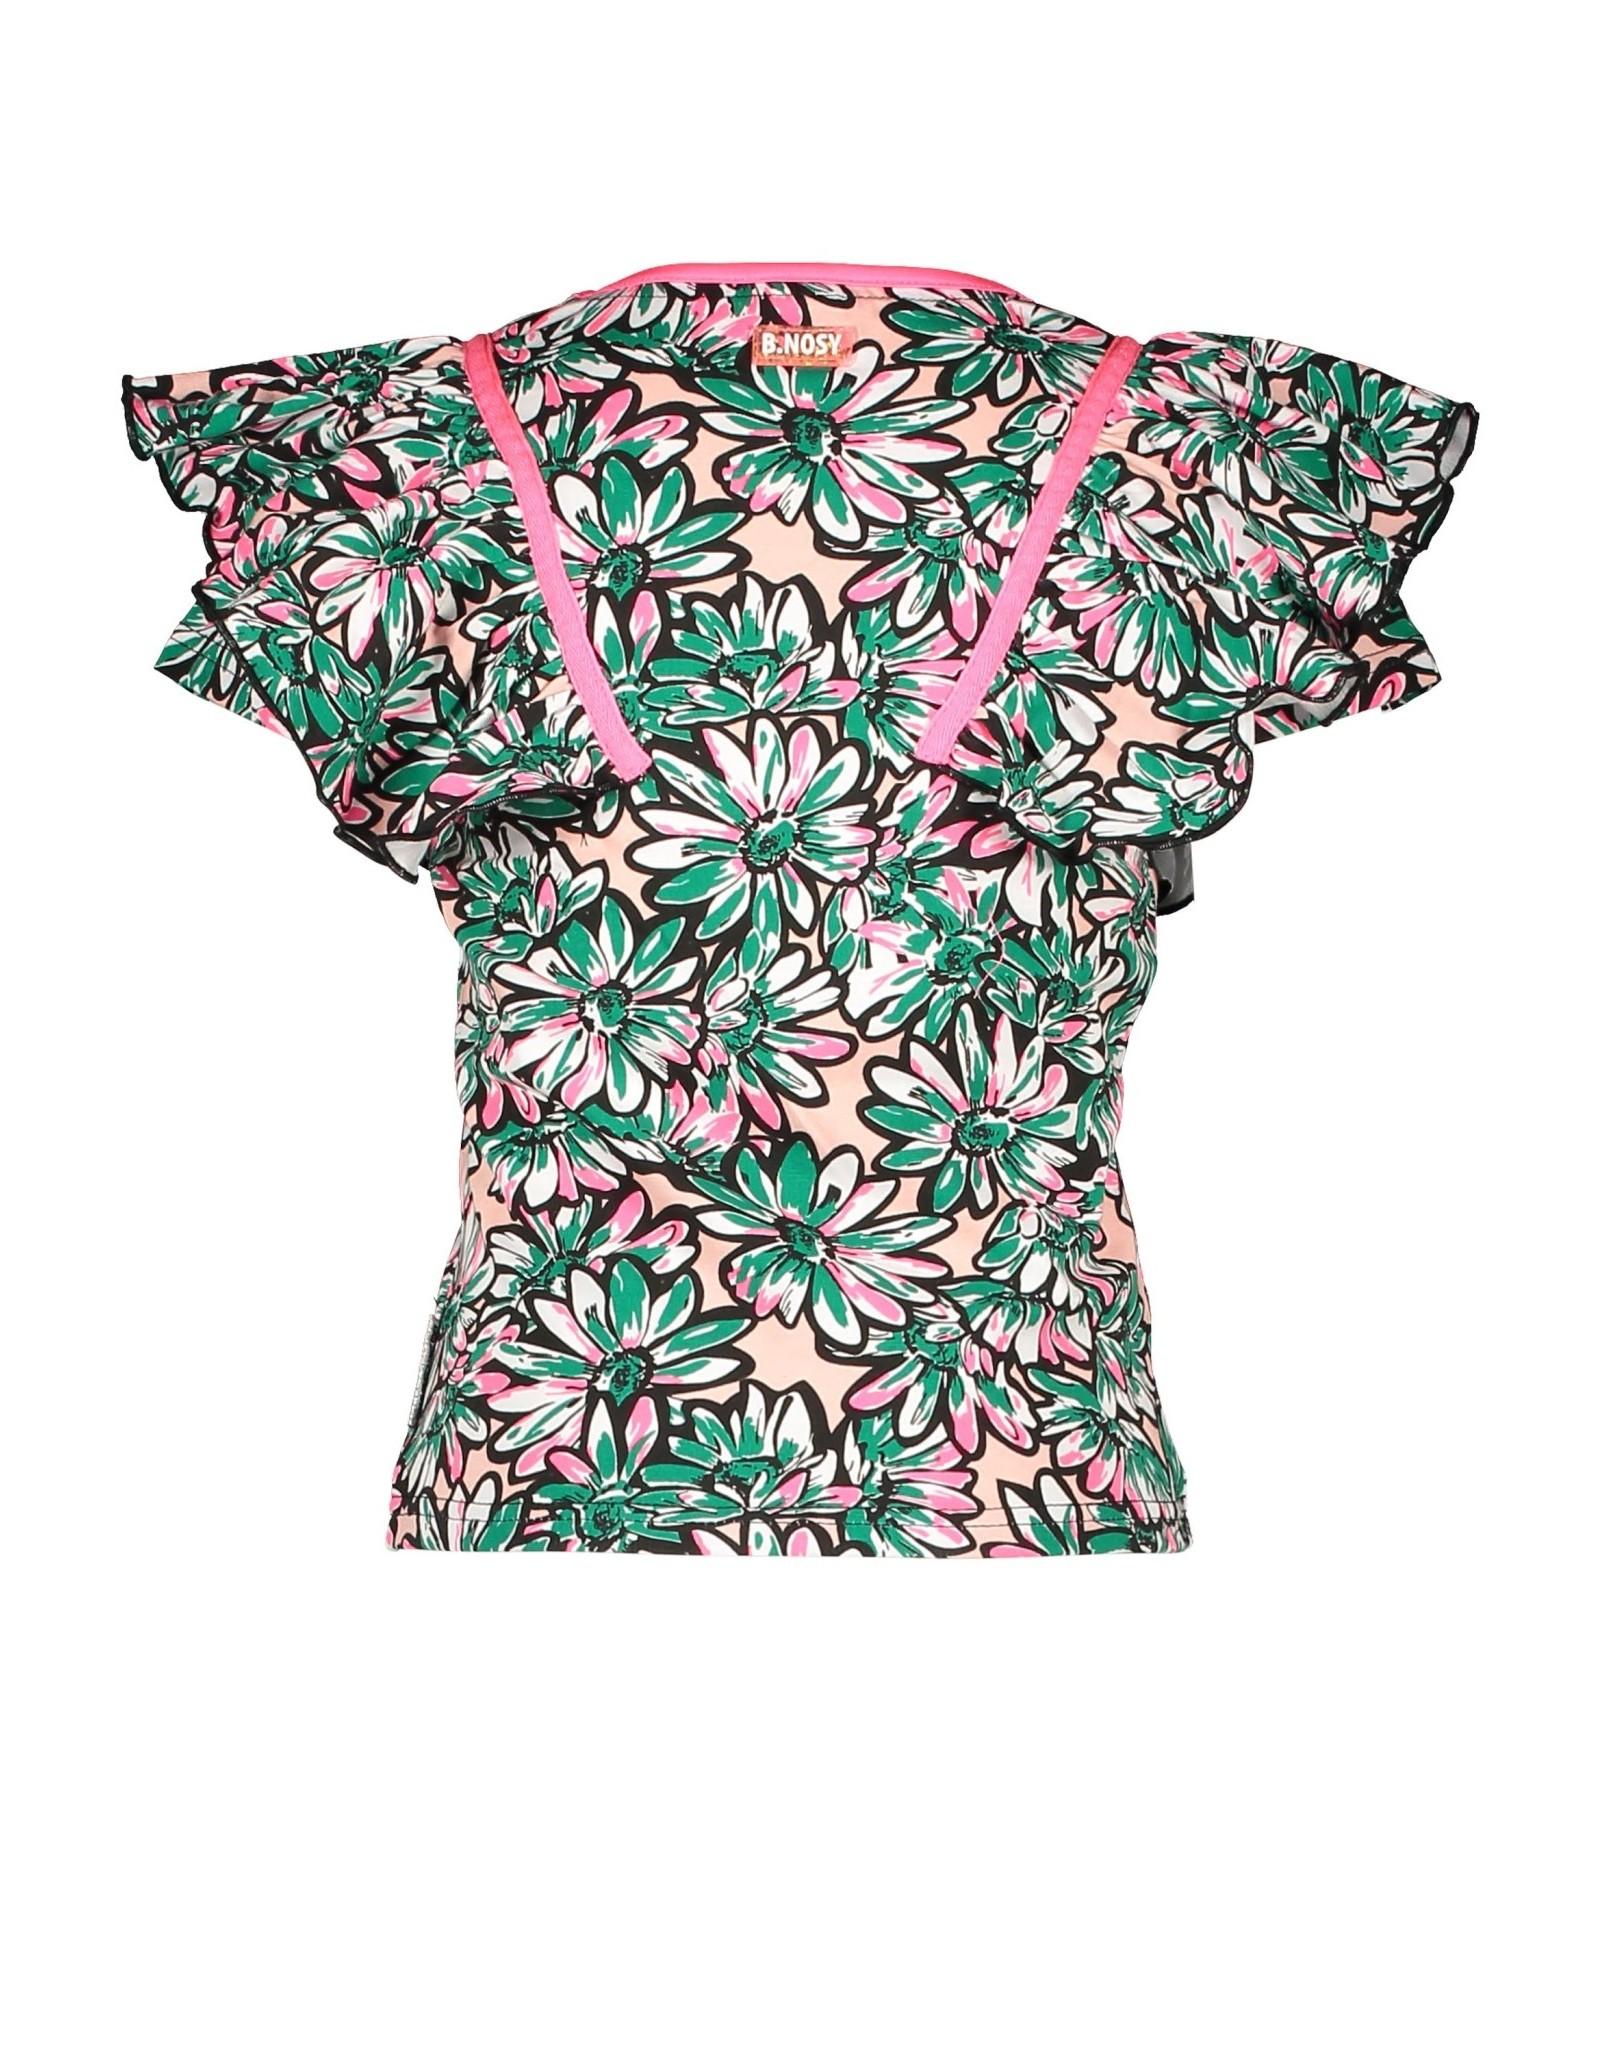 B.Nosy B.Nosy meisjes t-shirt Flowers Sunny AO